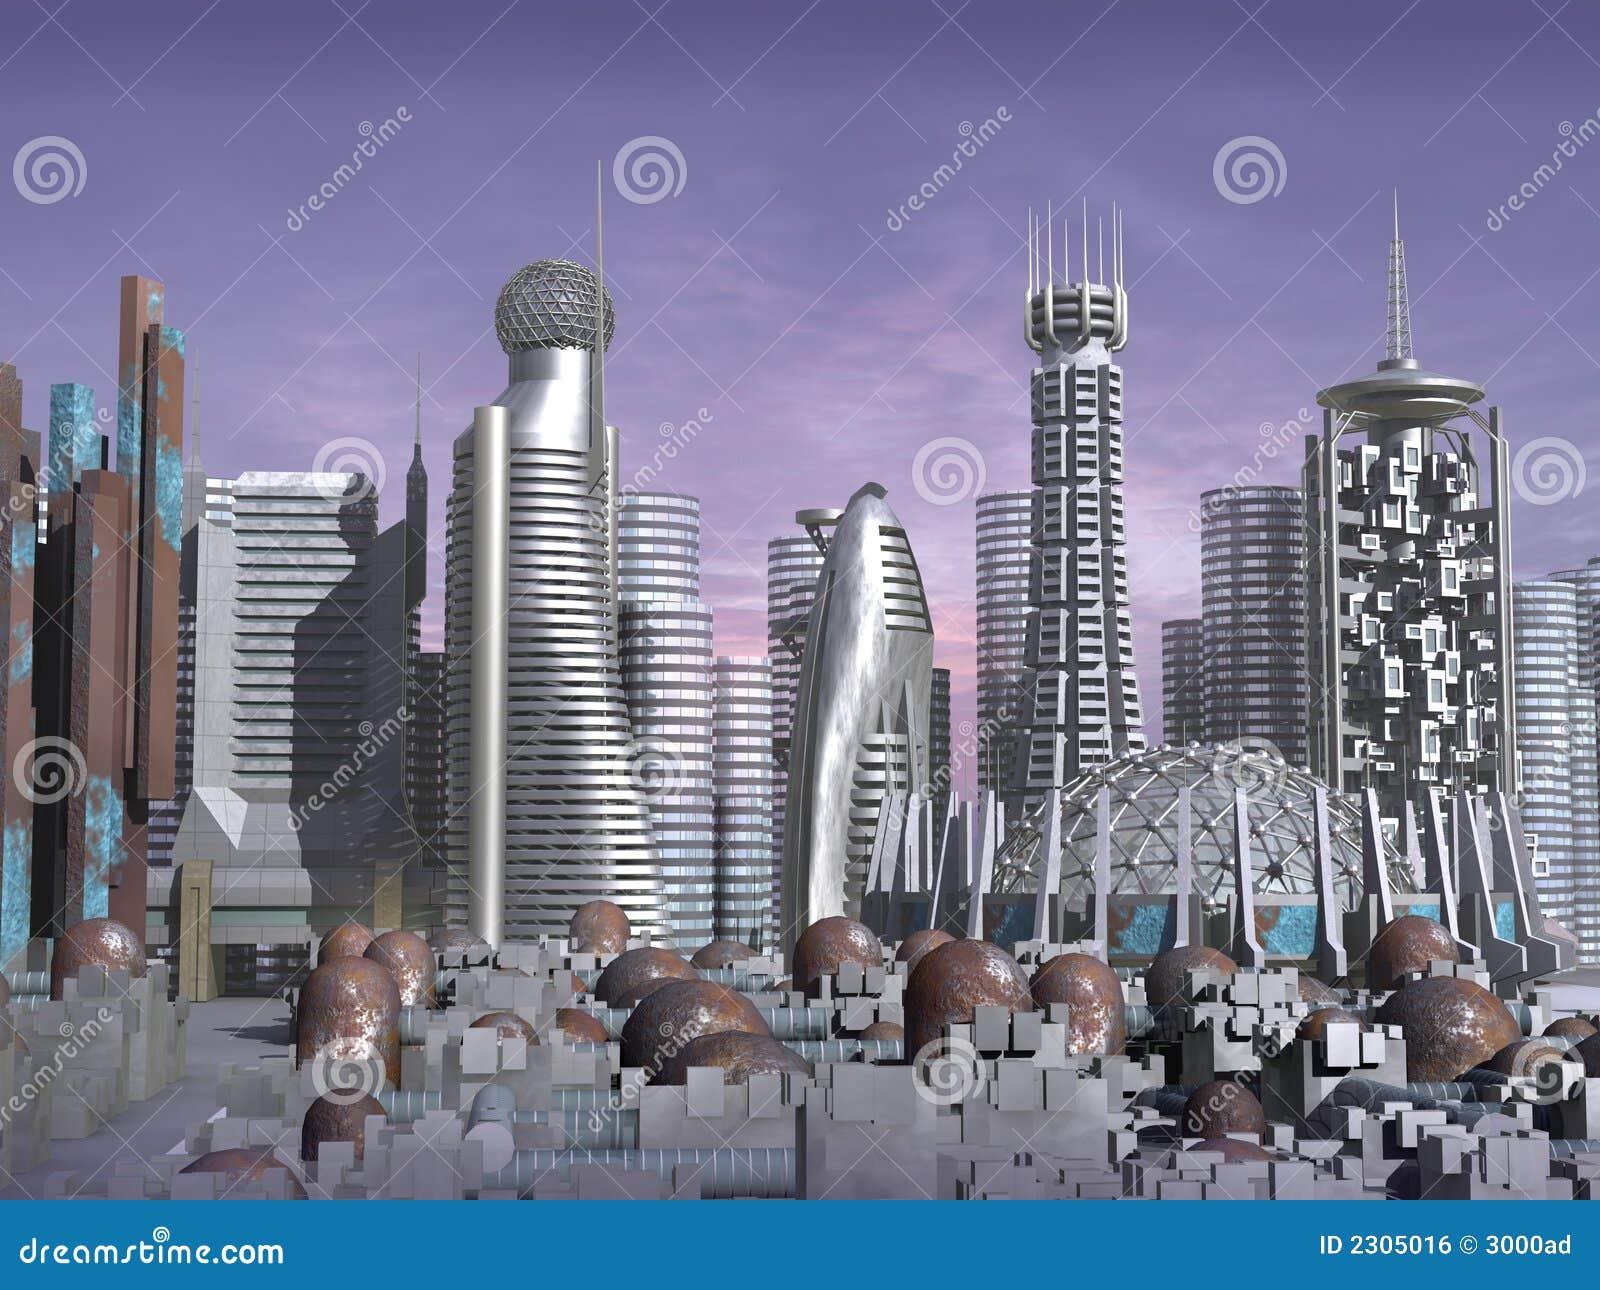 Baumuster 3d der Sciencefictionstadt